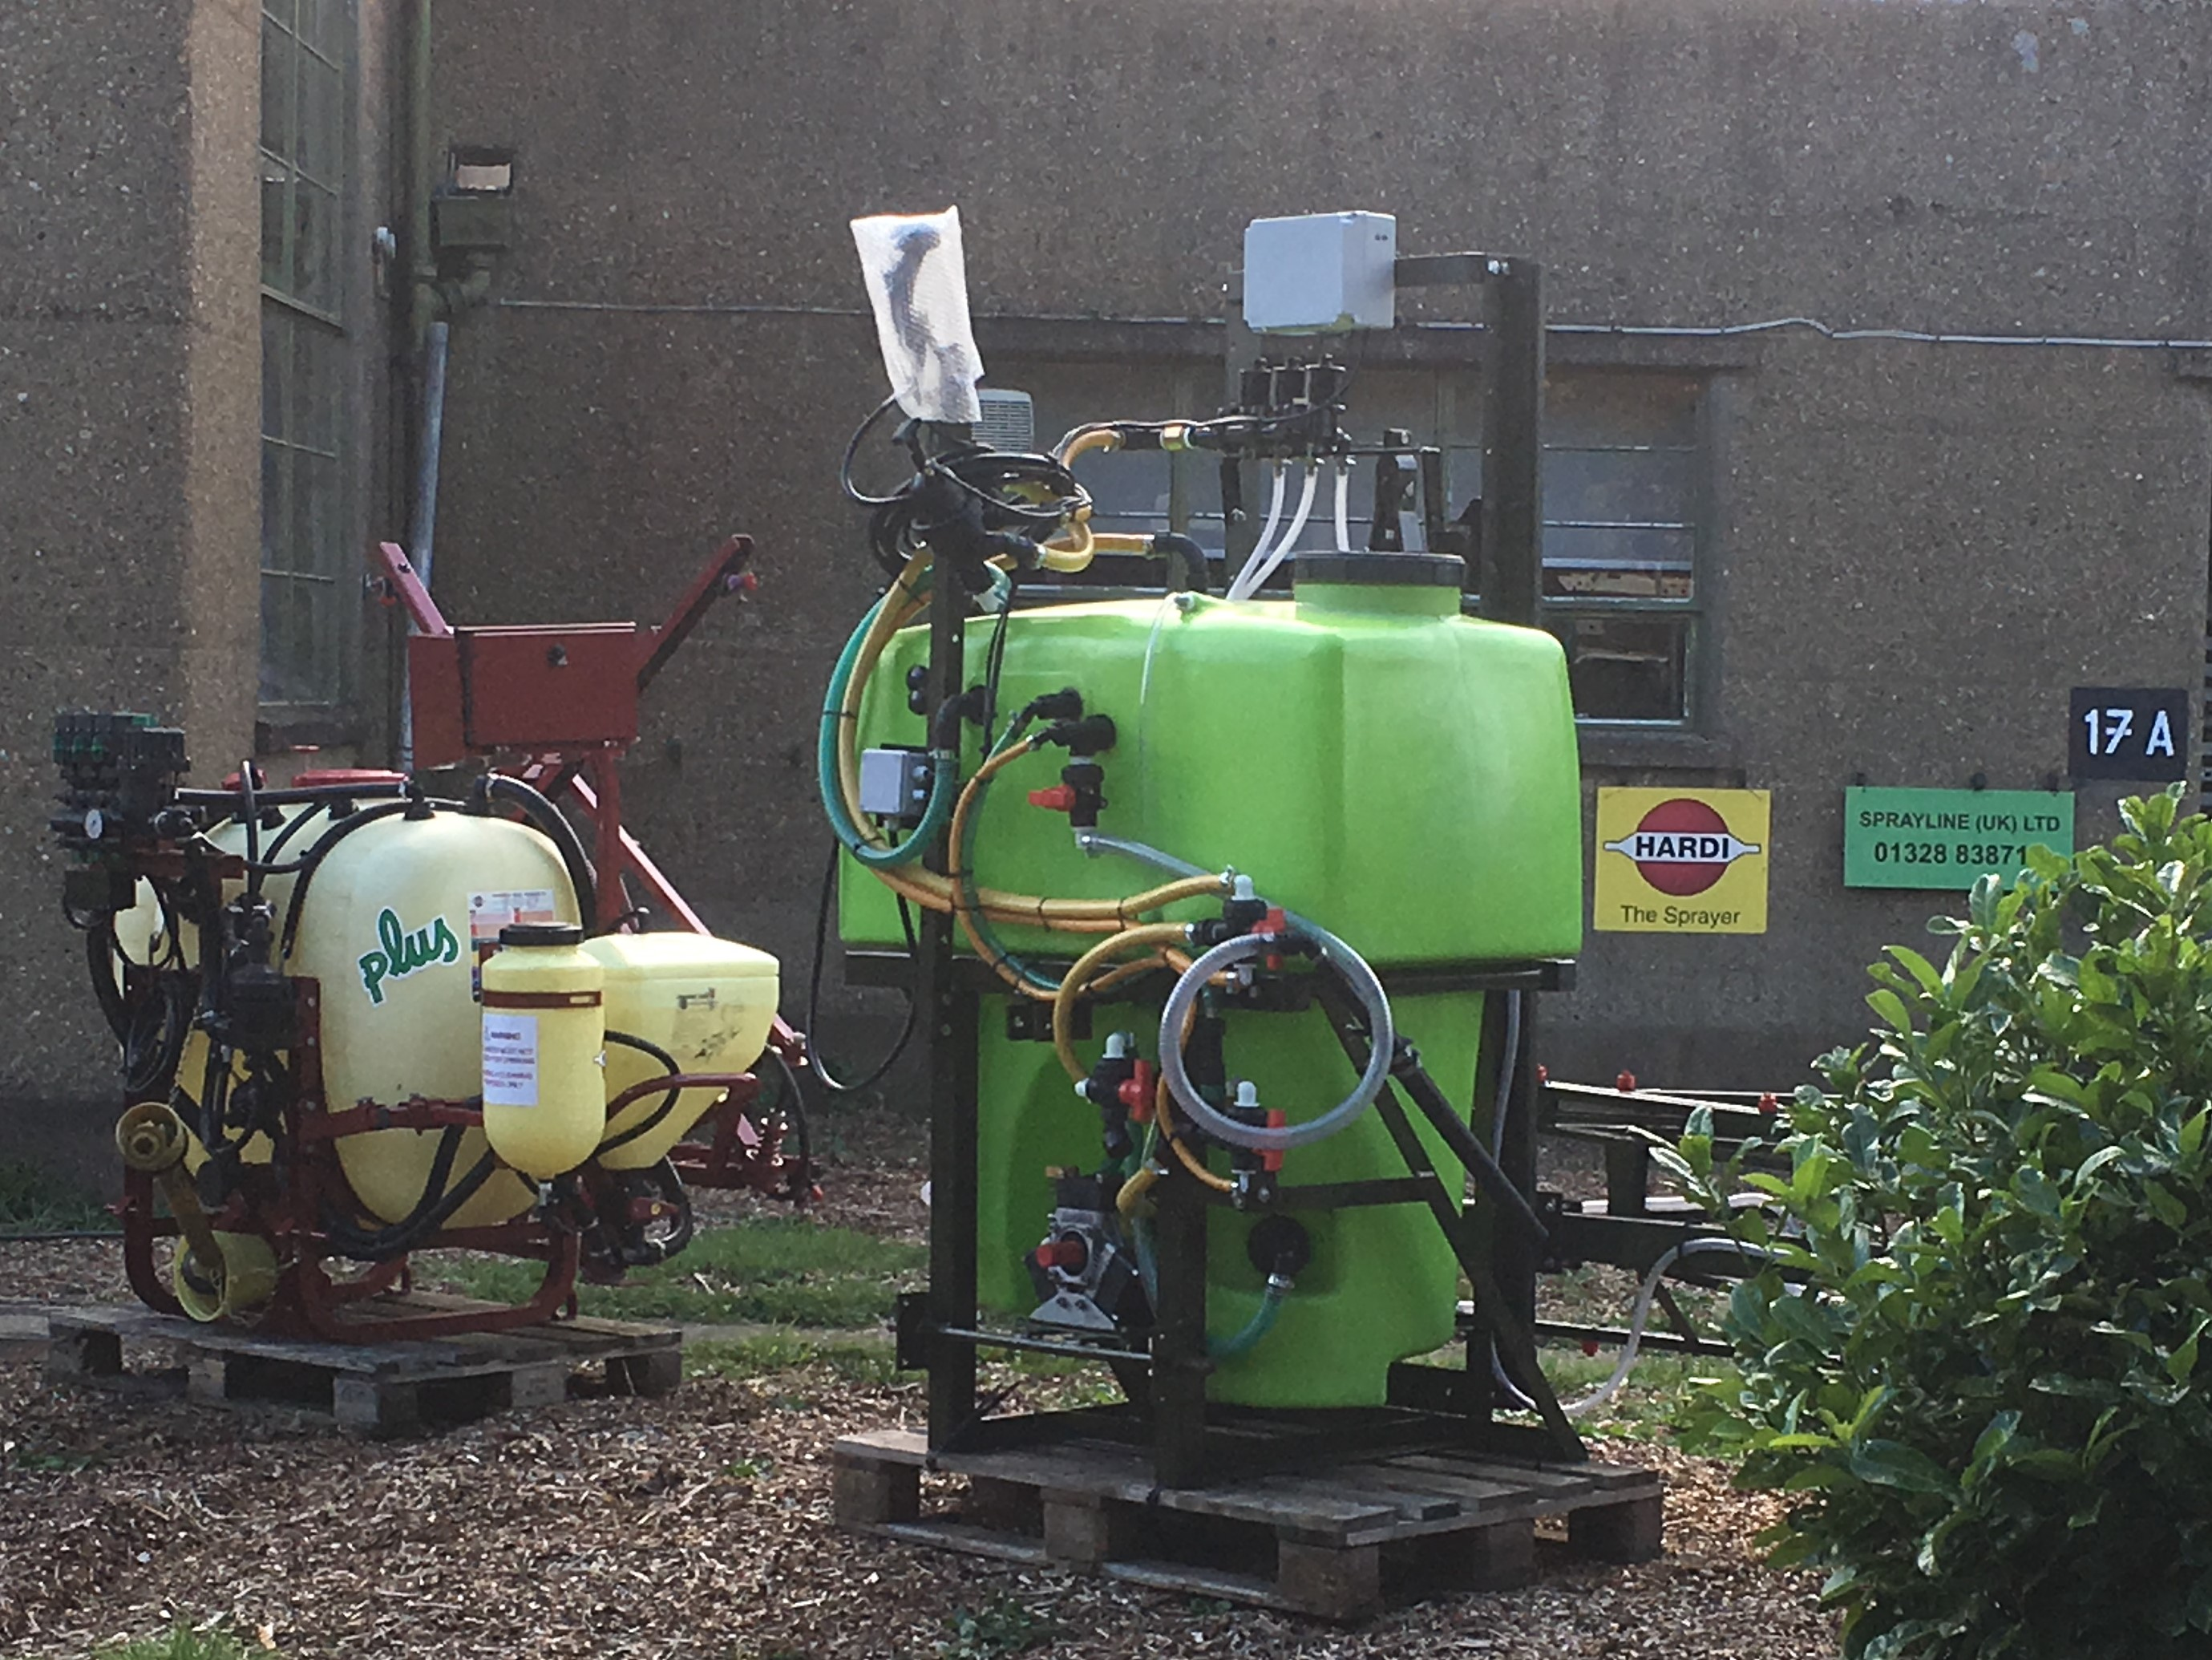 Sprayline (UK) Ltd